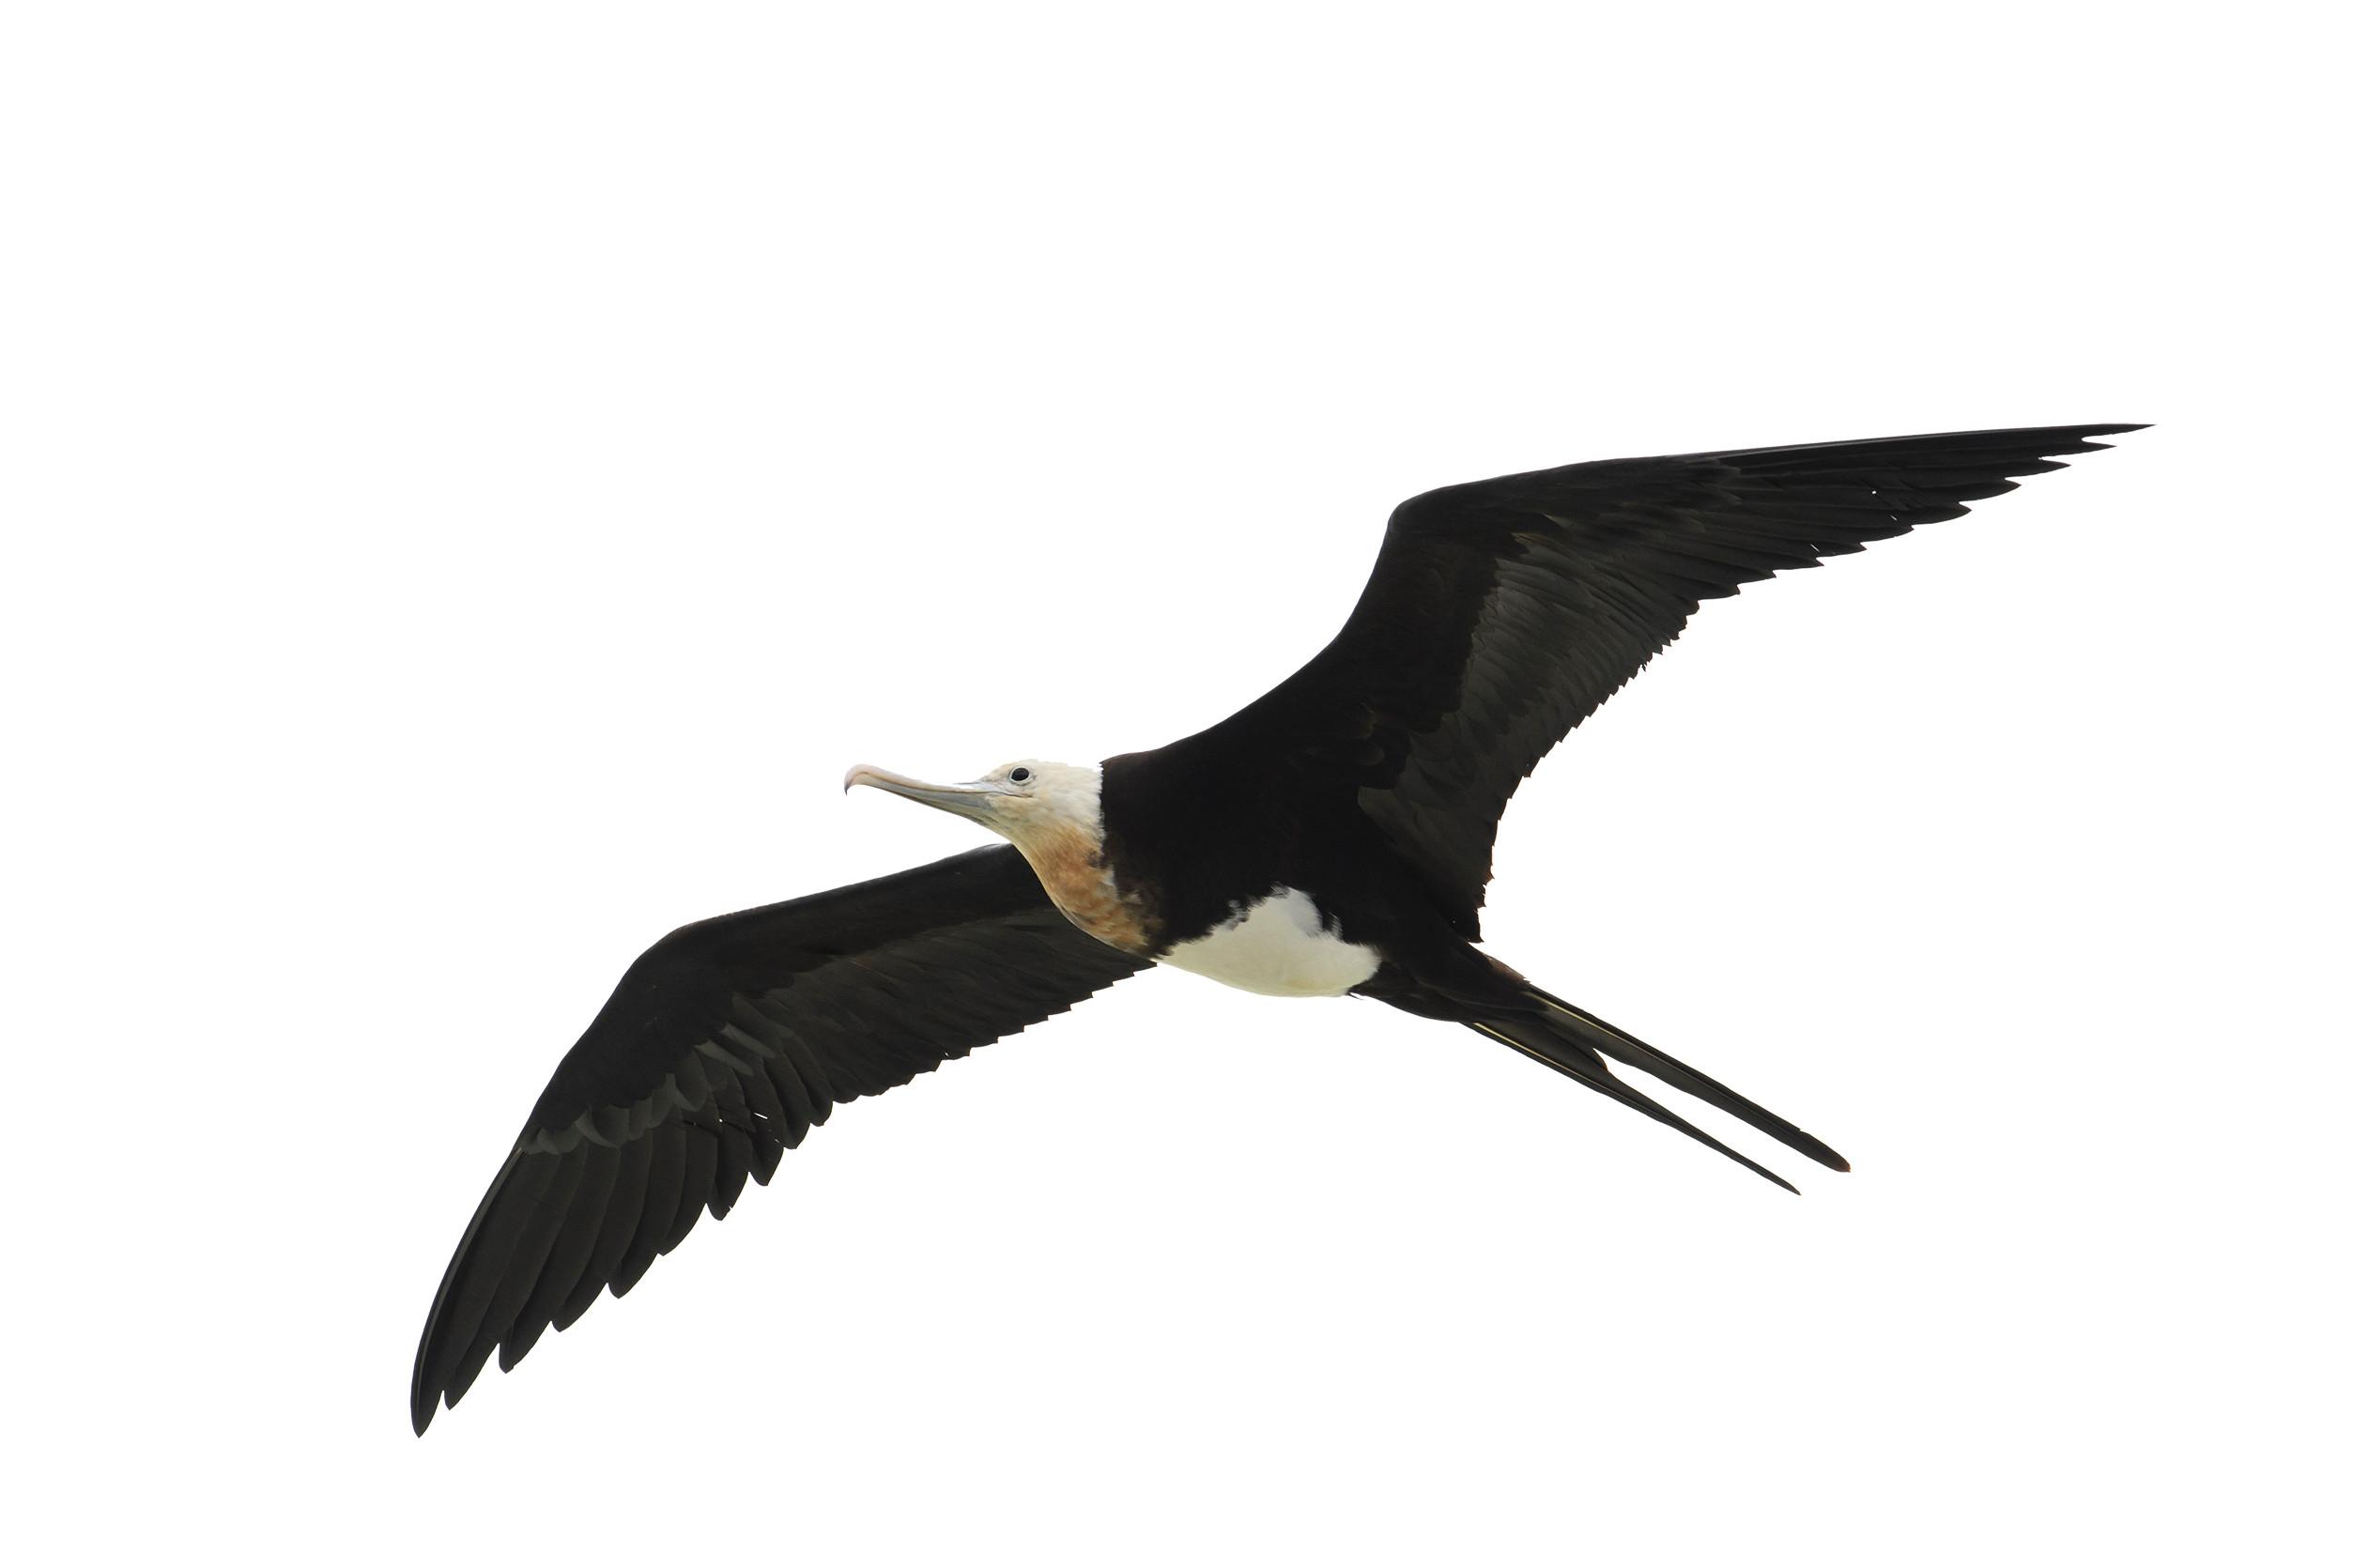 DSC-FL0719 05 frigatebird